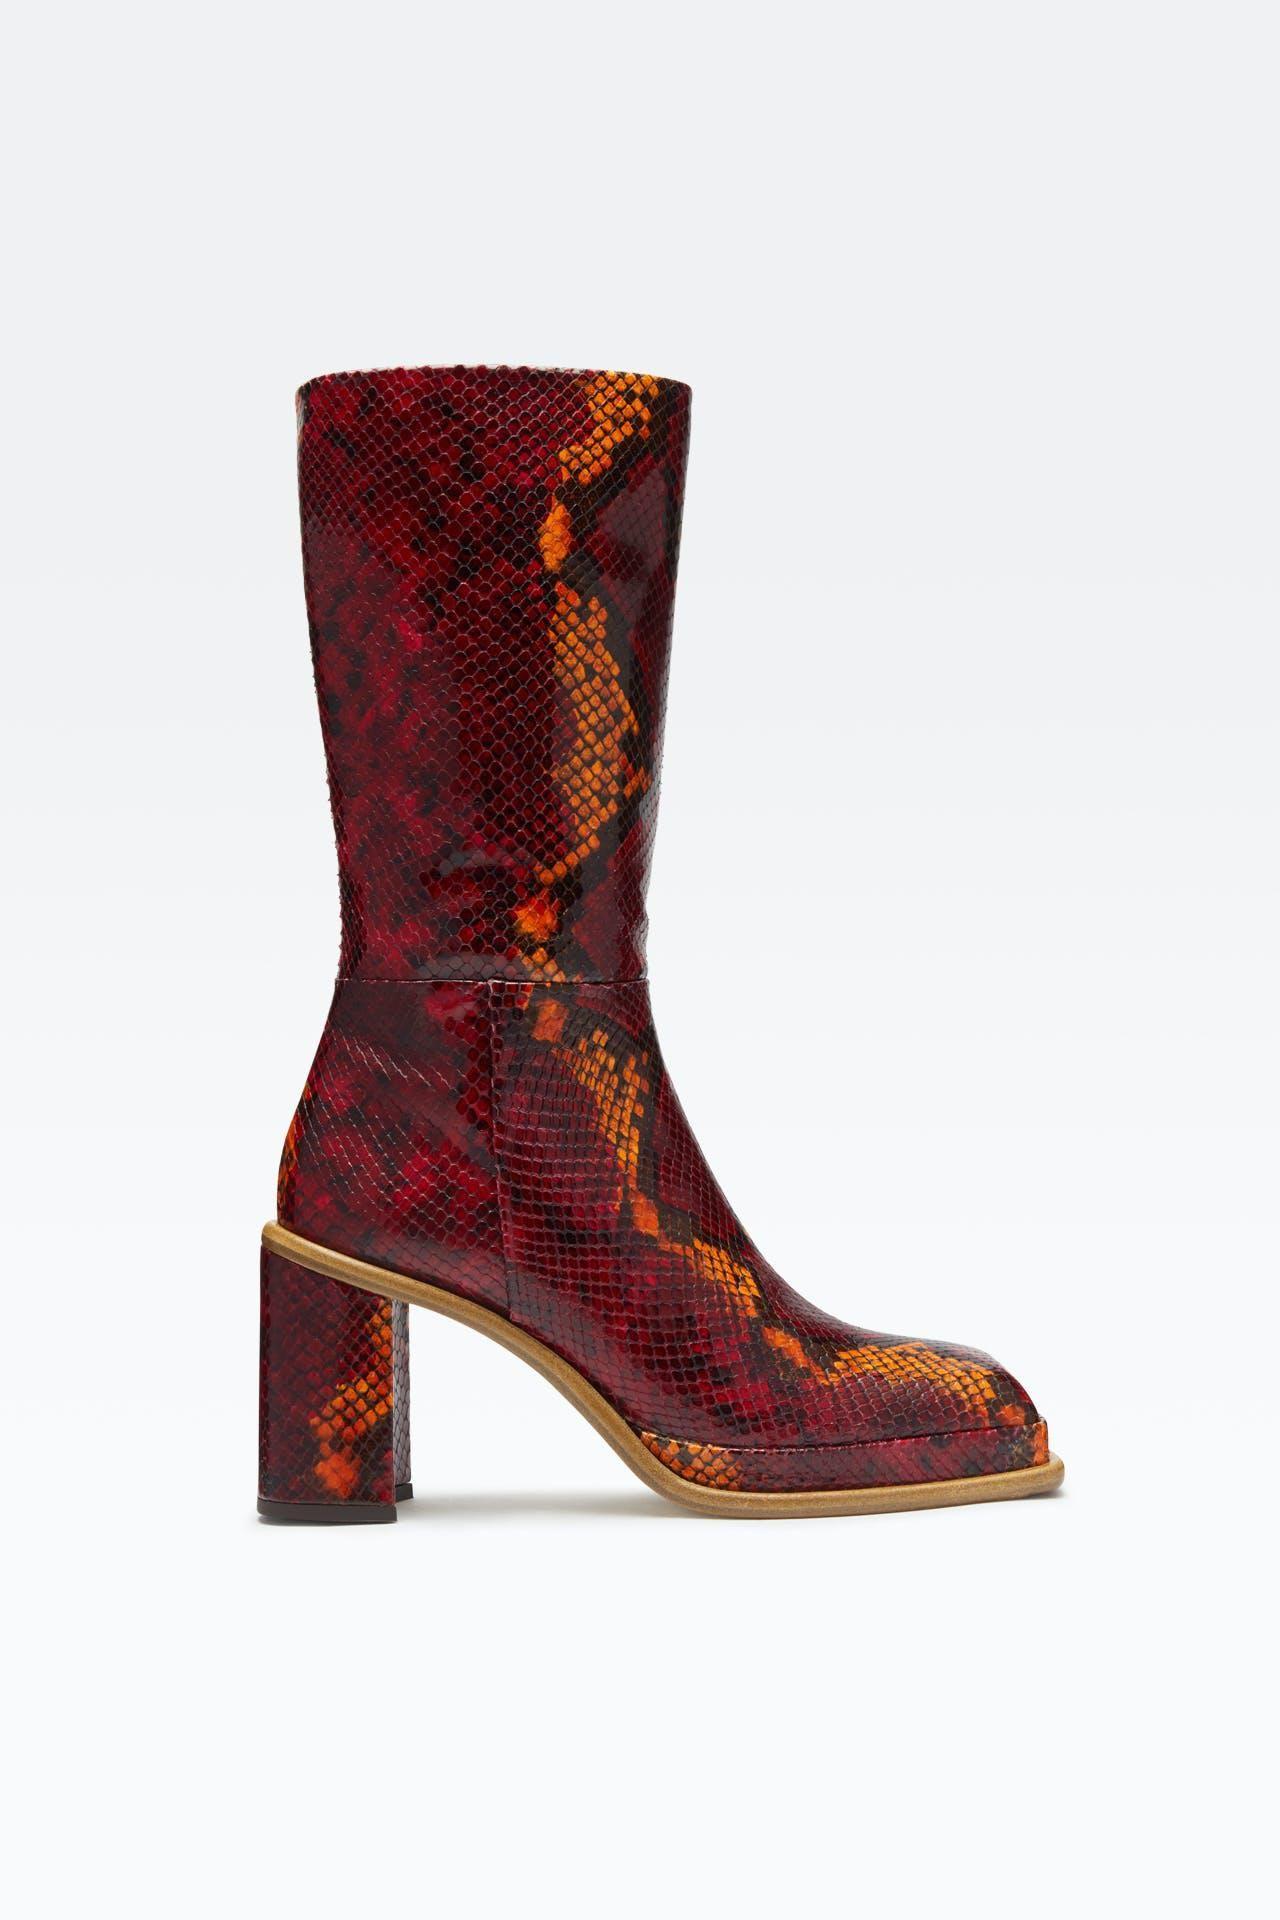 miista abril red boots